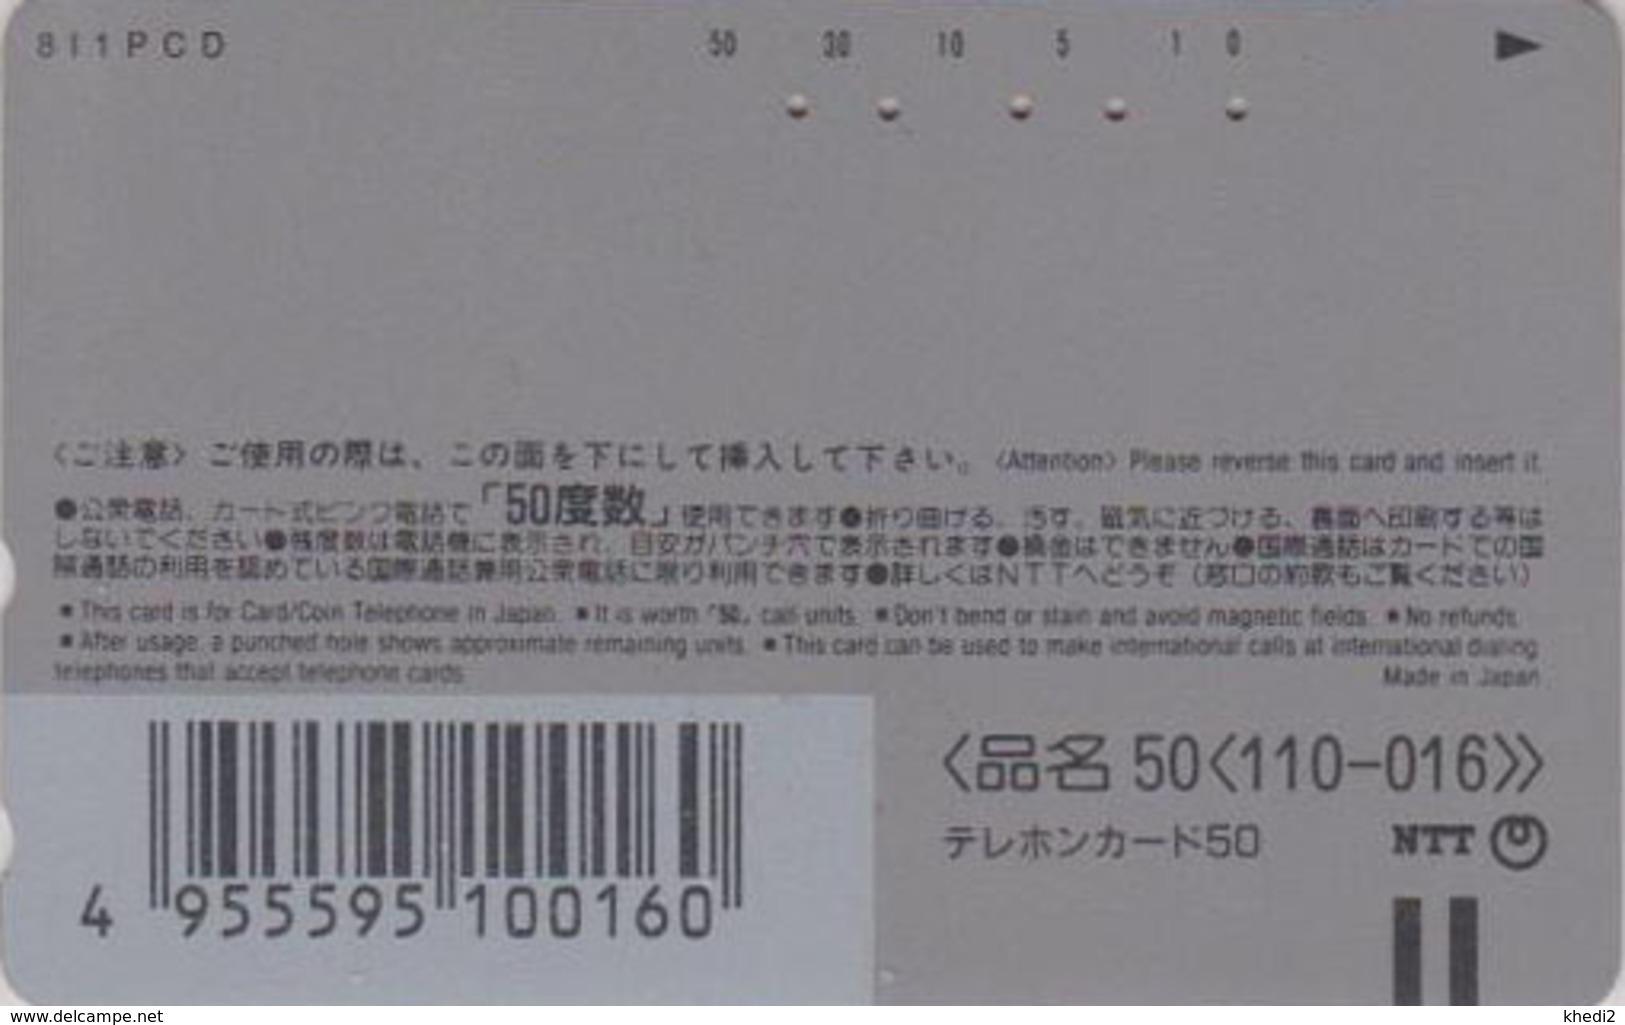 TC Japon / 110-016 - AVIATION - LUFTHANSA - Japan Phonecard Airlines / GERMANY - Avion 2214 - Avions